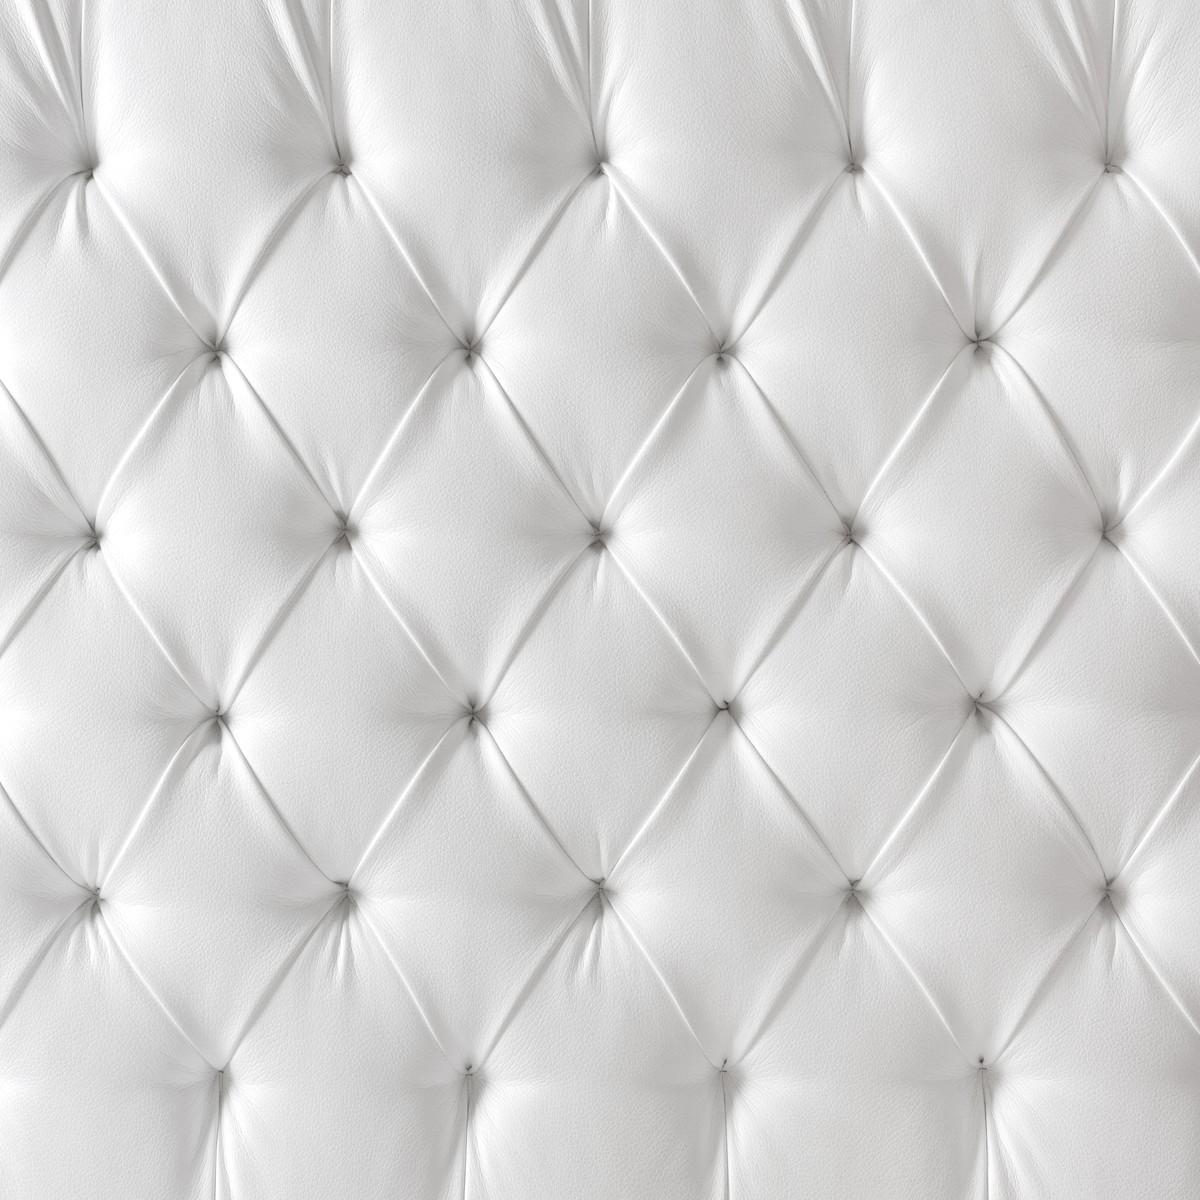 2018 Latest Black And White Leather Sofas: Adesivo Papel De Parede - Capitonê No Elo7